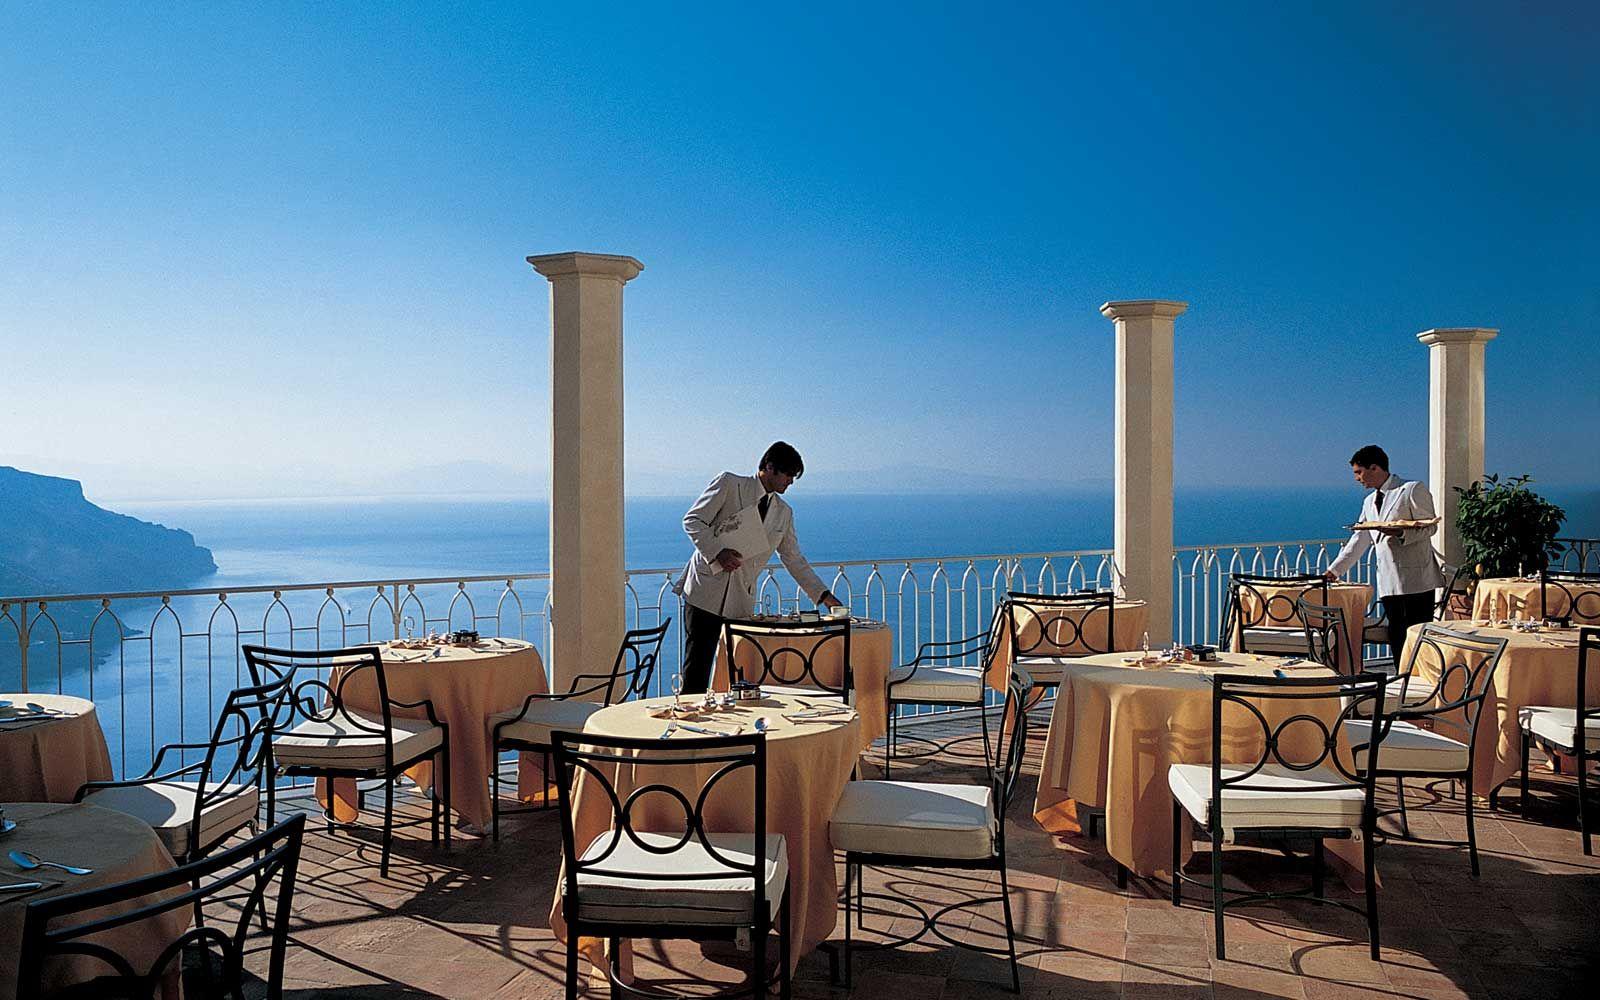 Restaurant - Belmond Hotel Caruso Ravello, Amalfi coast (Italy)